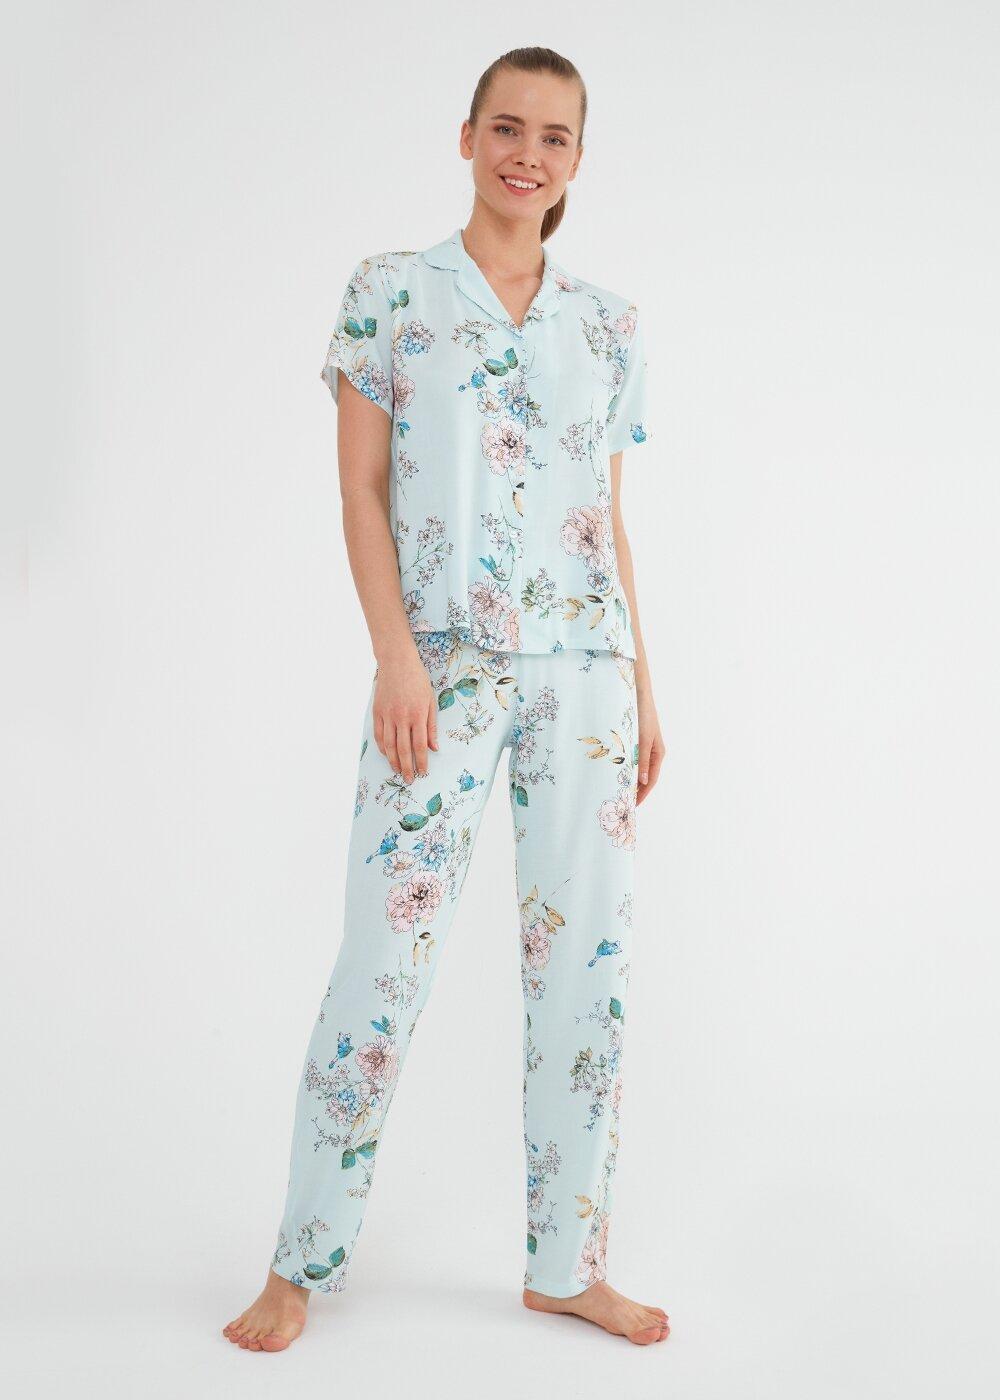 resm Linda Maskulen Pijama Takımı - DENİZ MAVİSİ BASKILI